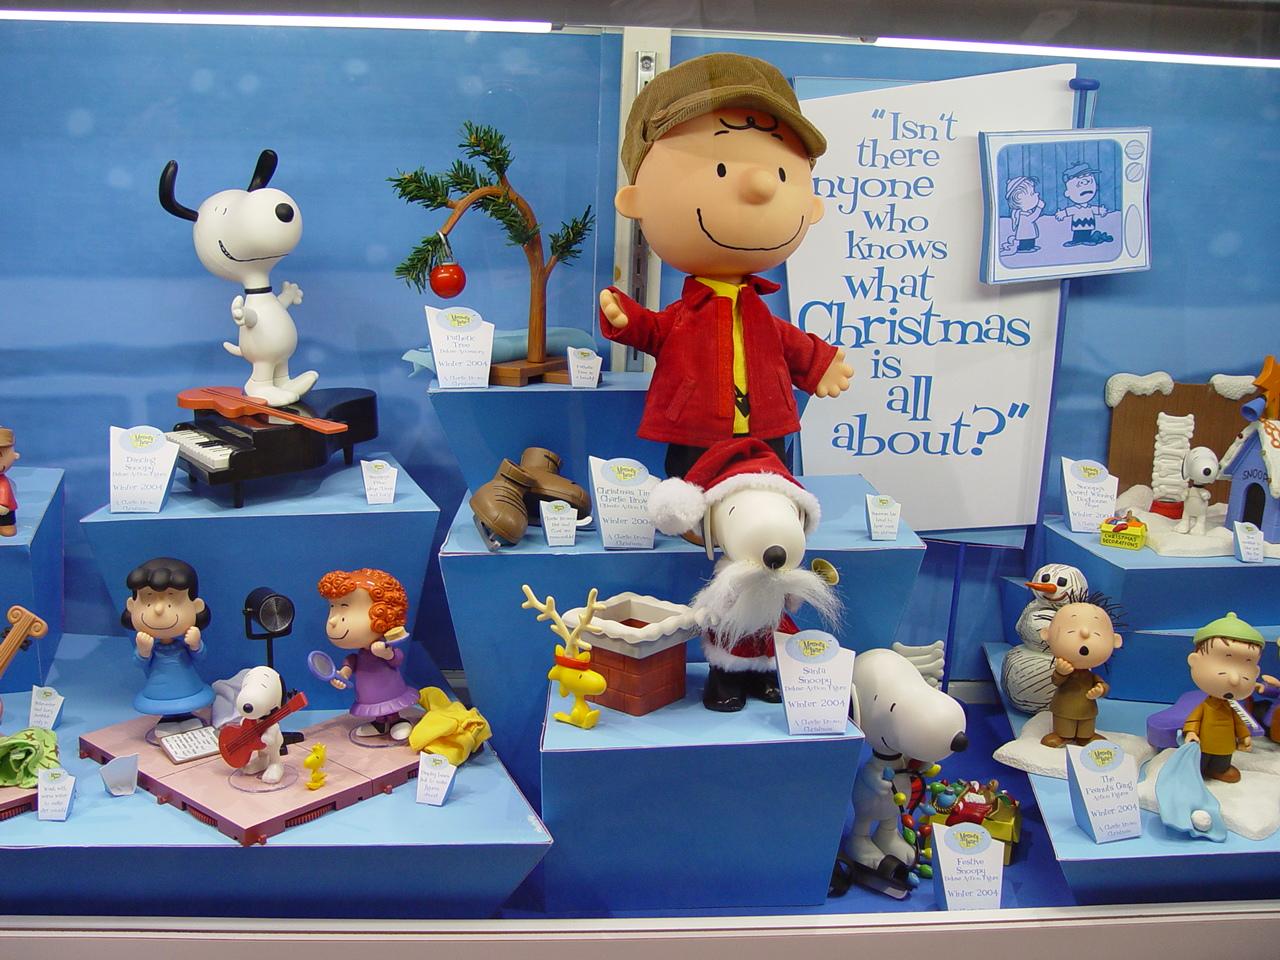 Peanuts Snoopy Toys